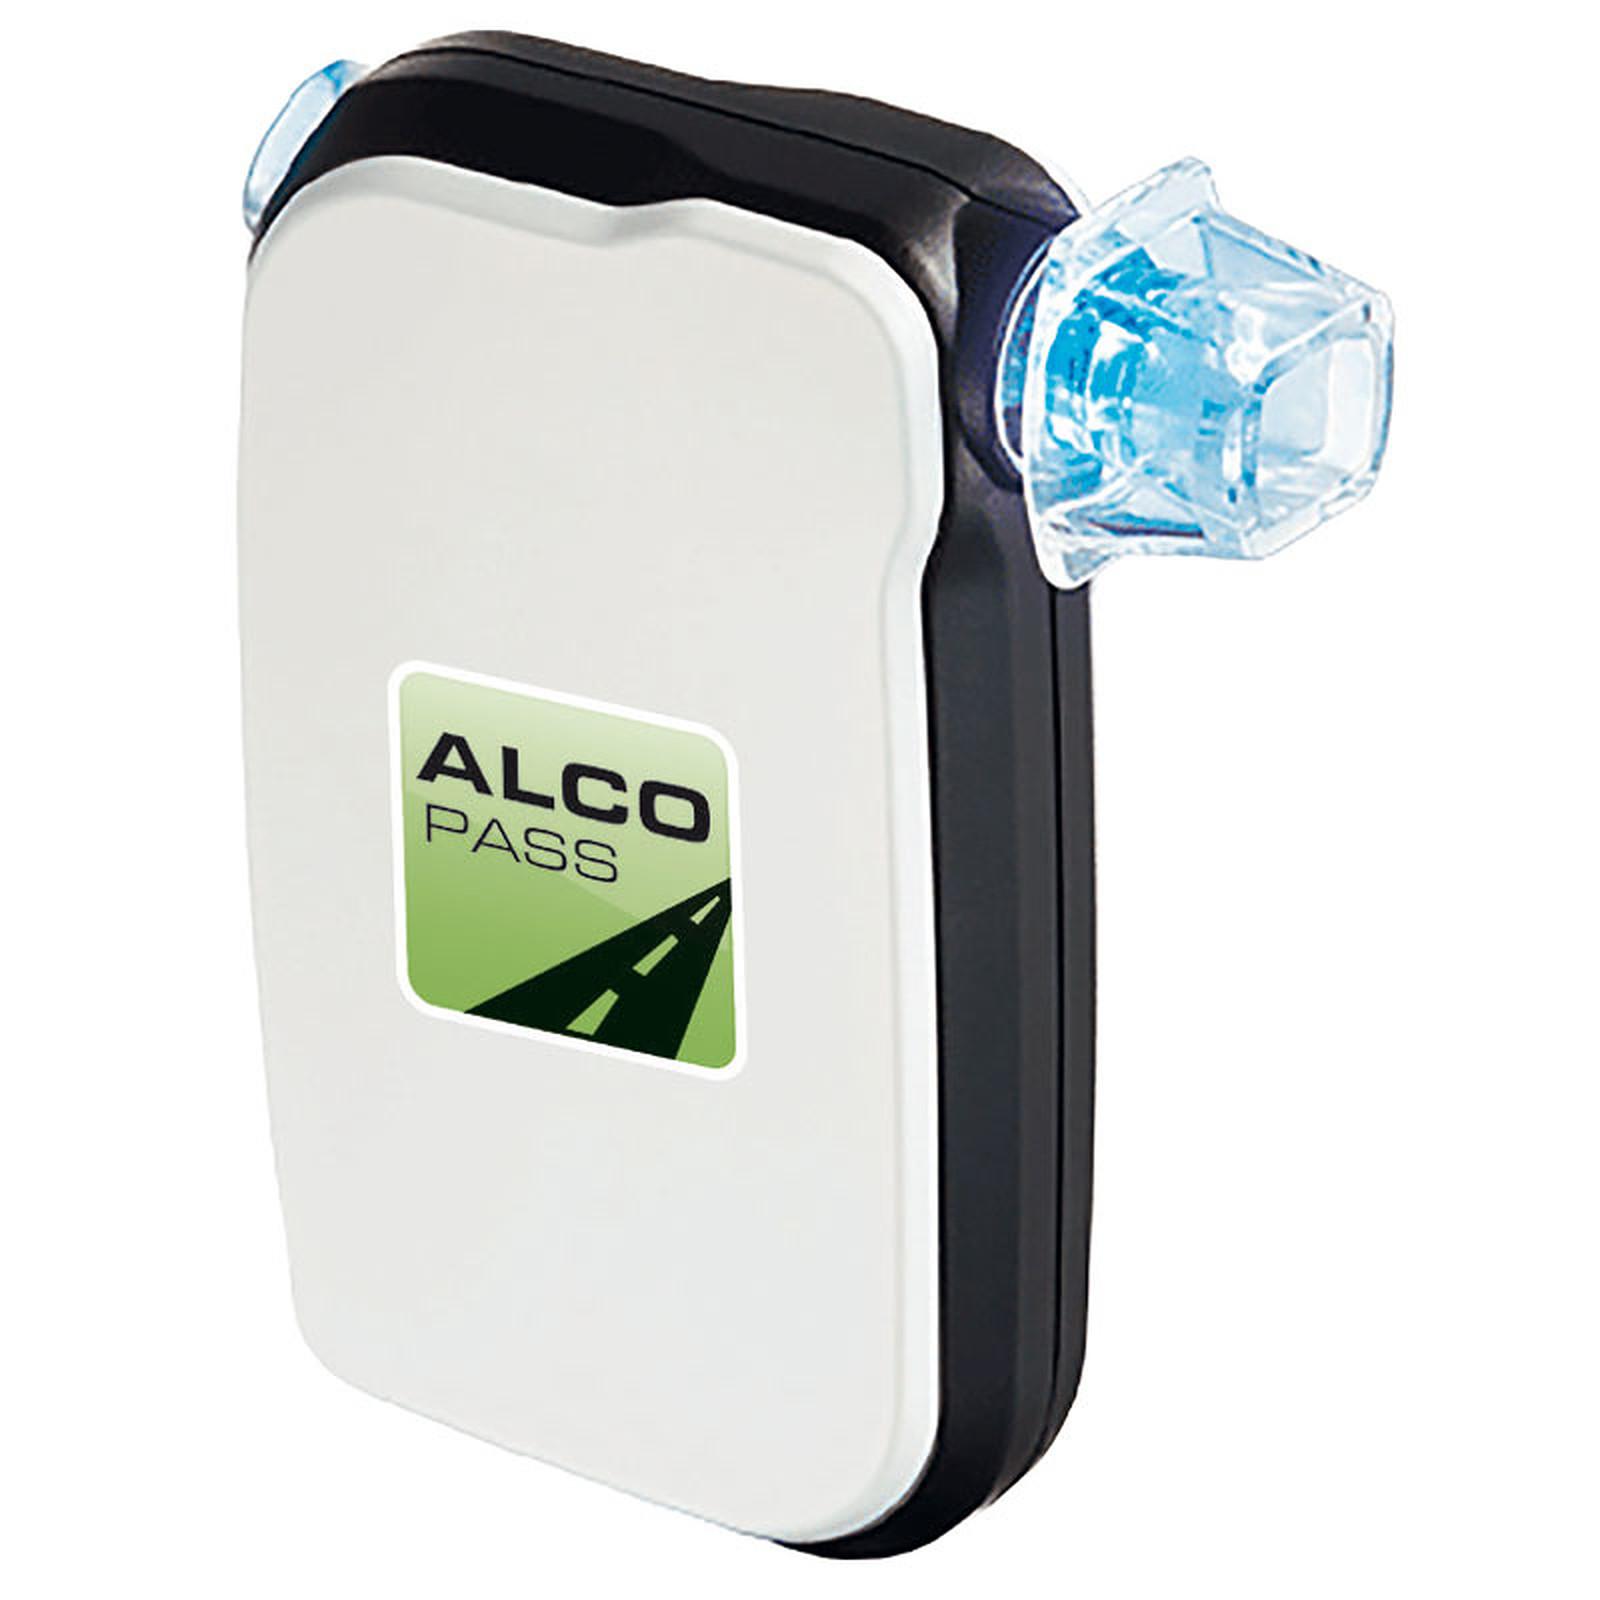 Alcopass C1